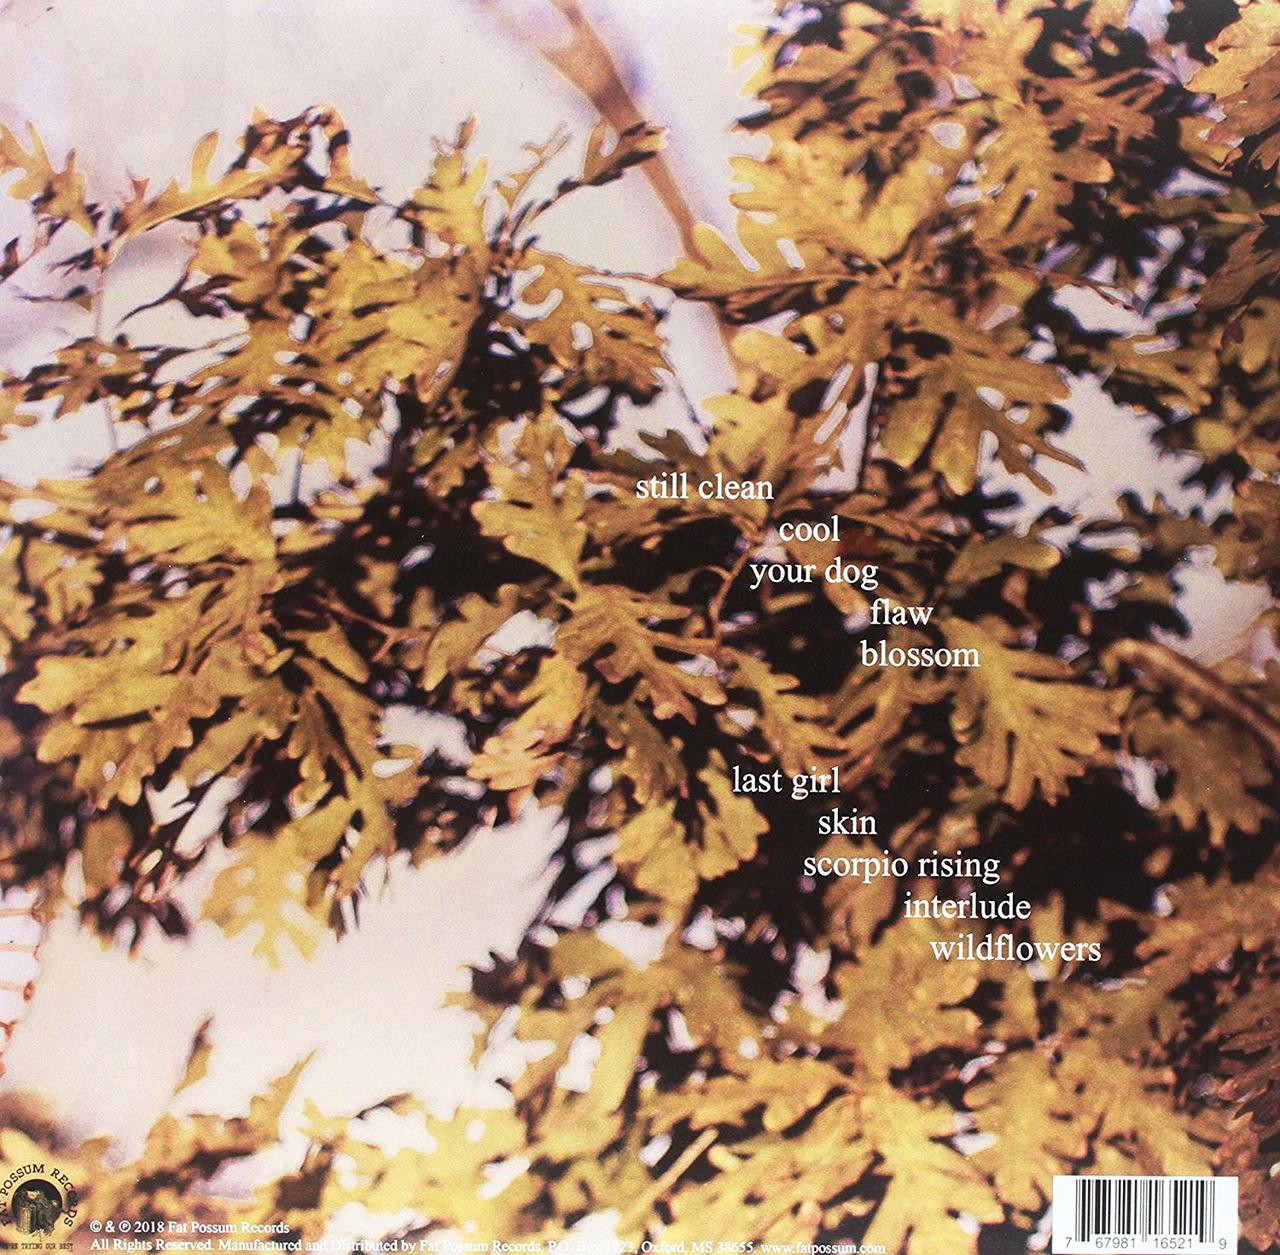 SOCCER MOMMY -CLEAN VINYL LP-Brand New-Still Sealed